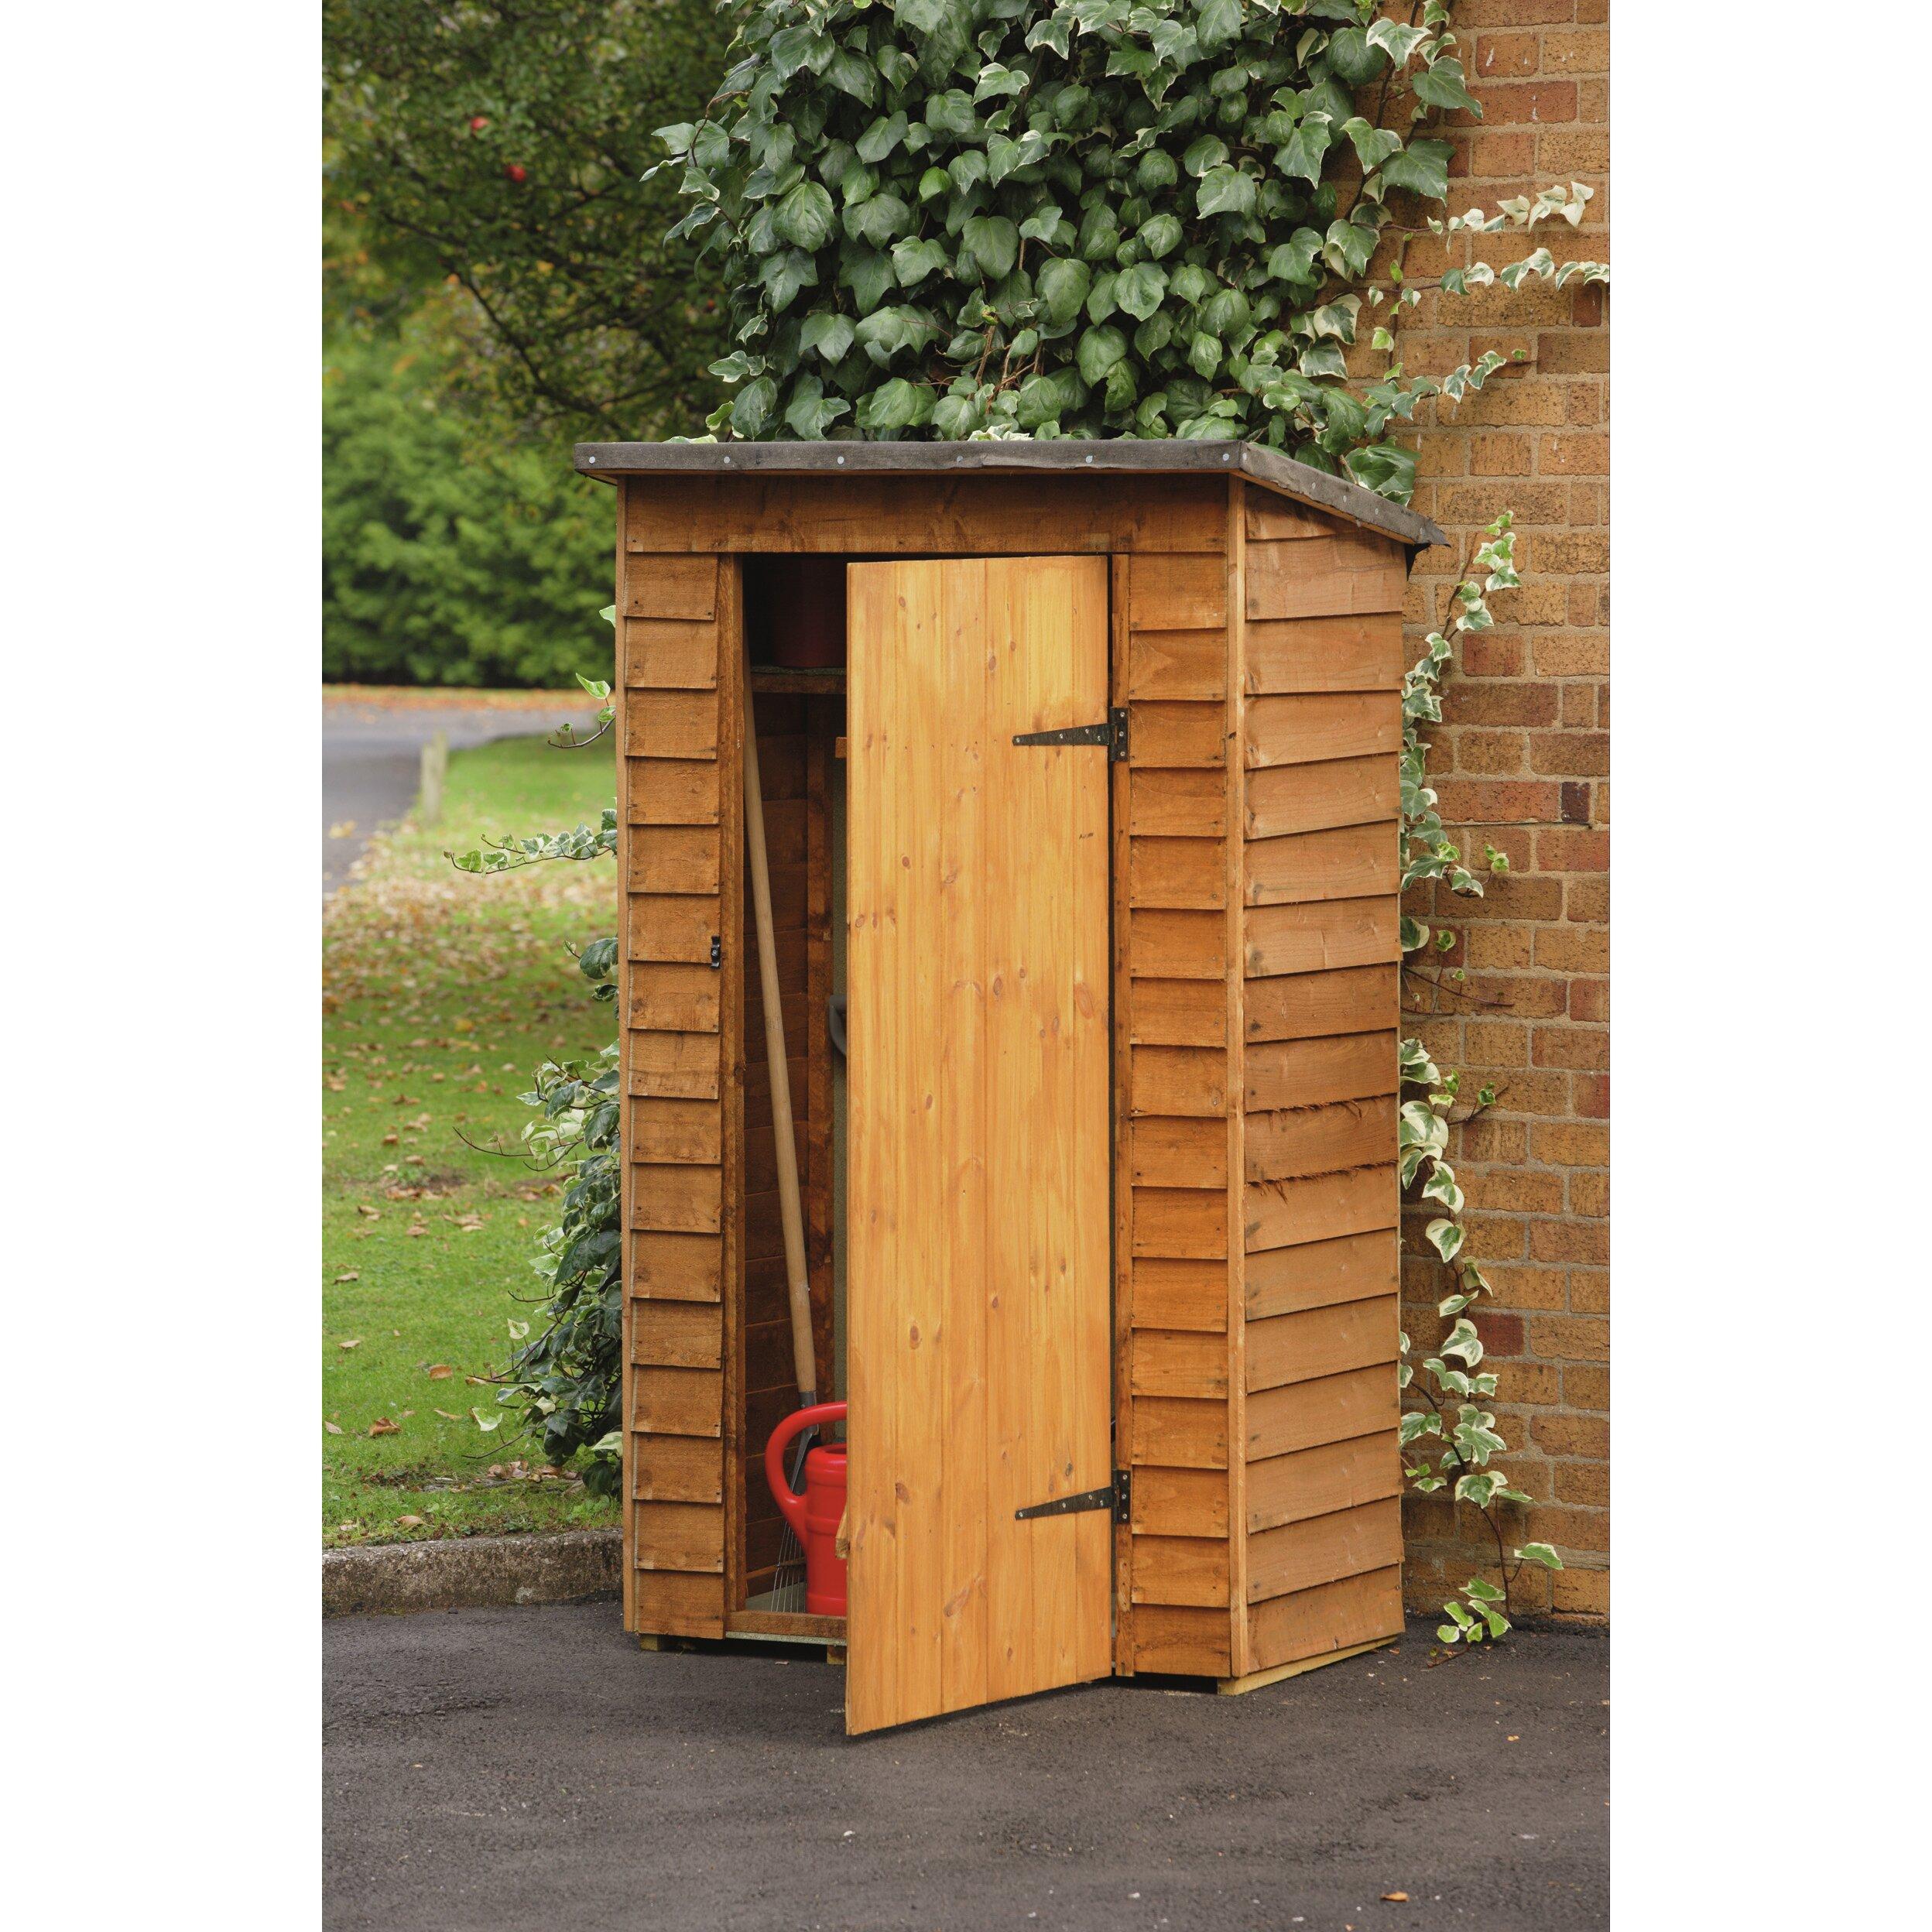 garden sheds 6 x 5 inspiration garden sheds scotland design garden sheds scotland - Garden Sheds 6 X 2